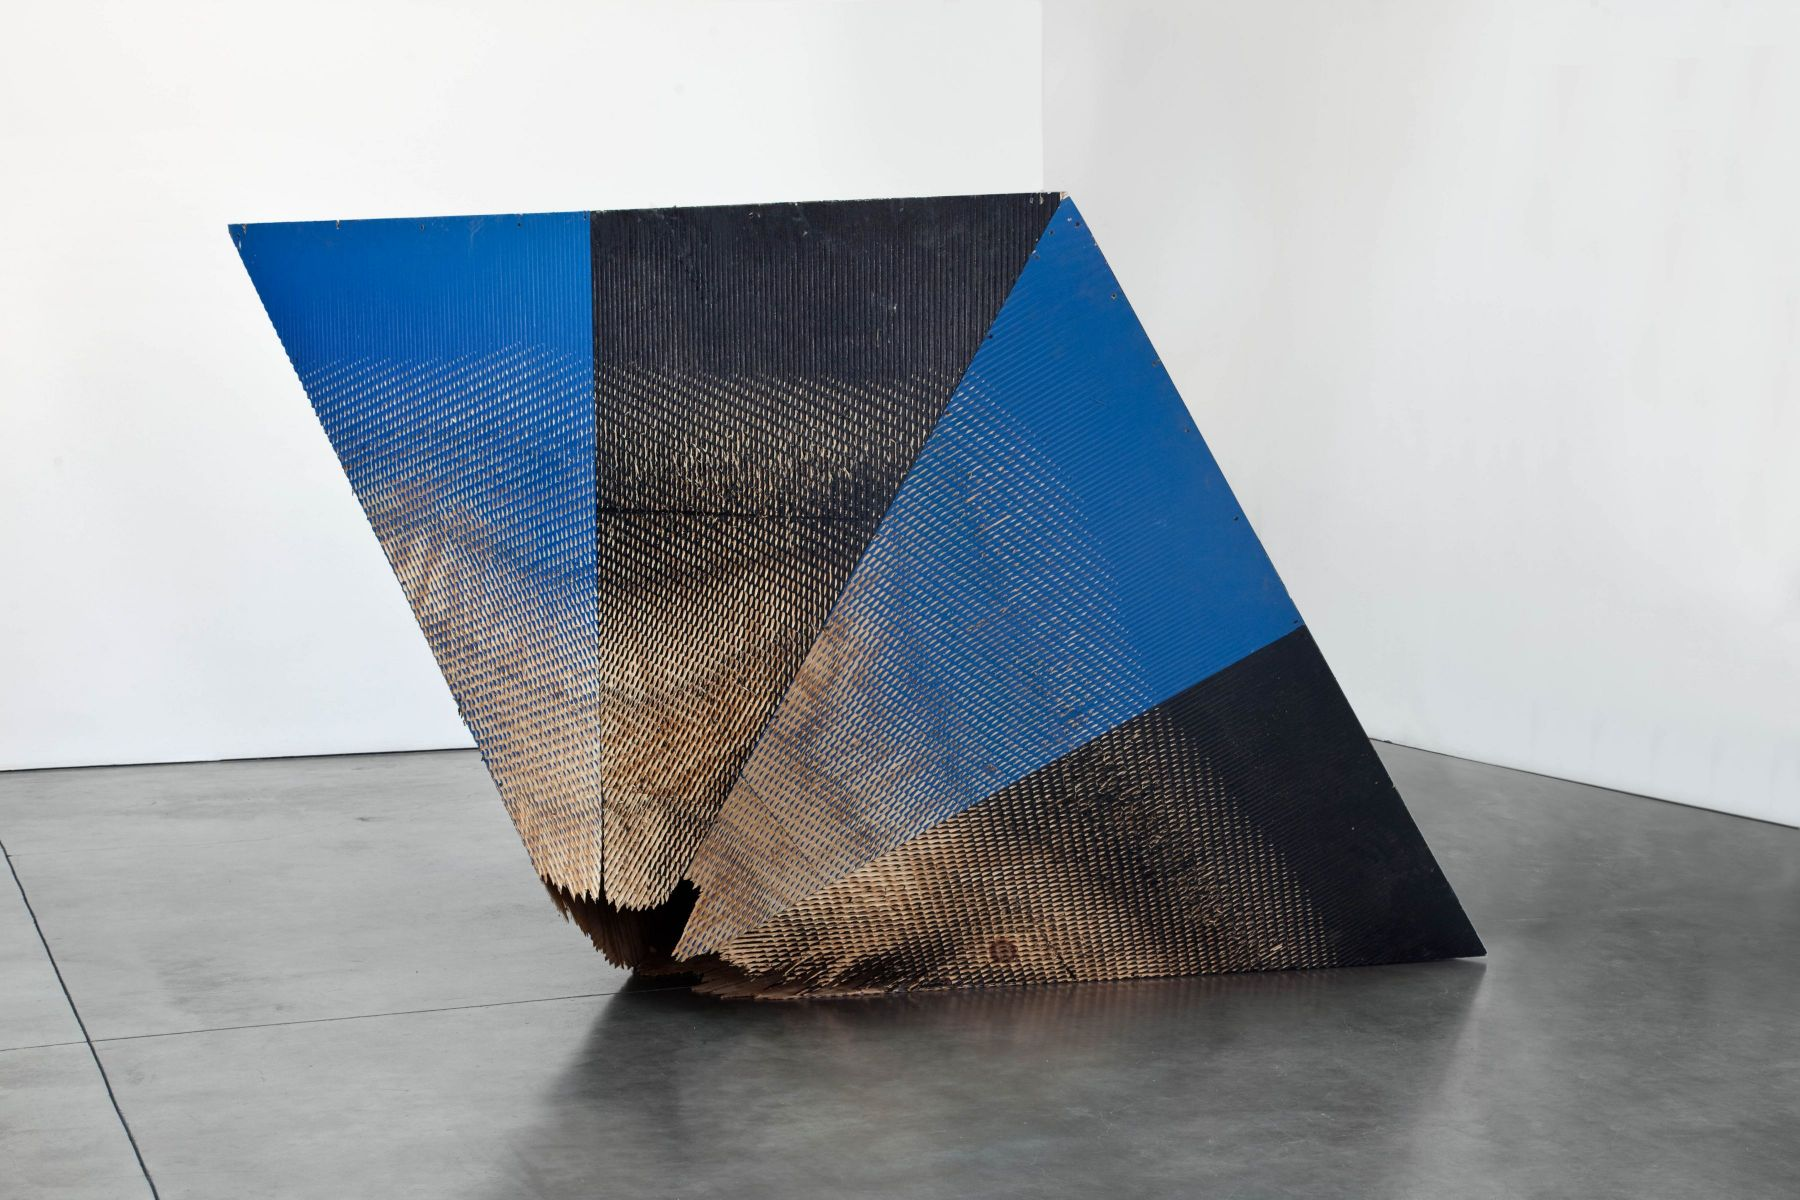 Michael DeLucia Projection